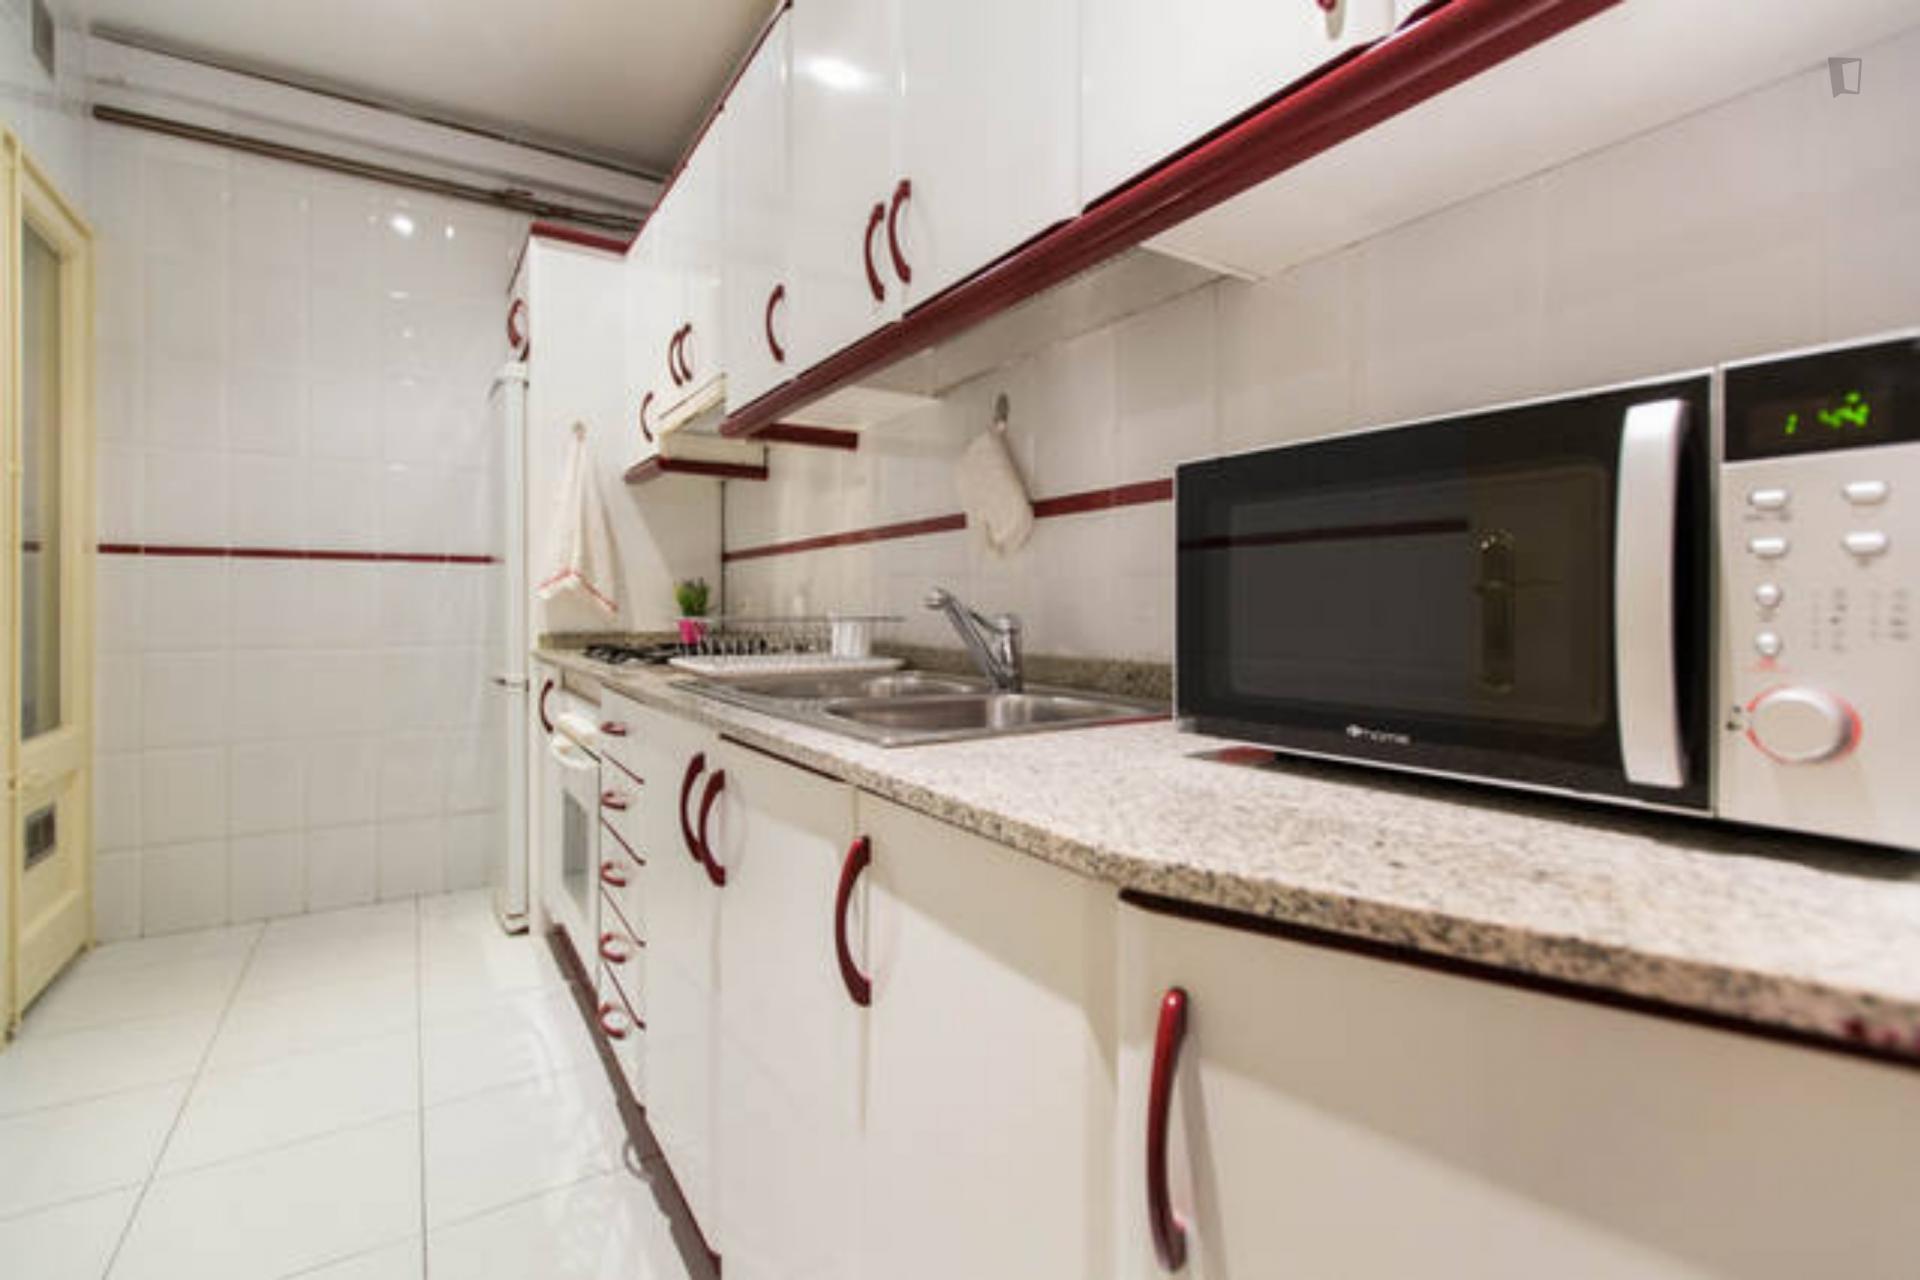 Molló 2 - Spacious apartment in Barcelona